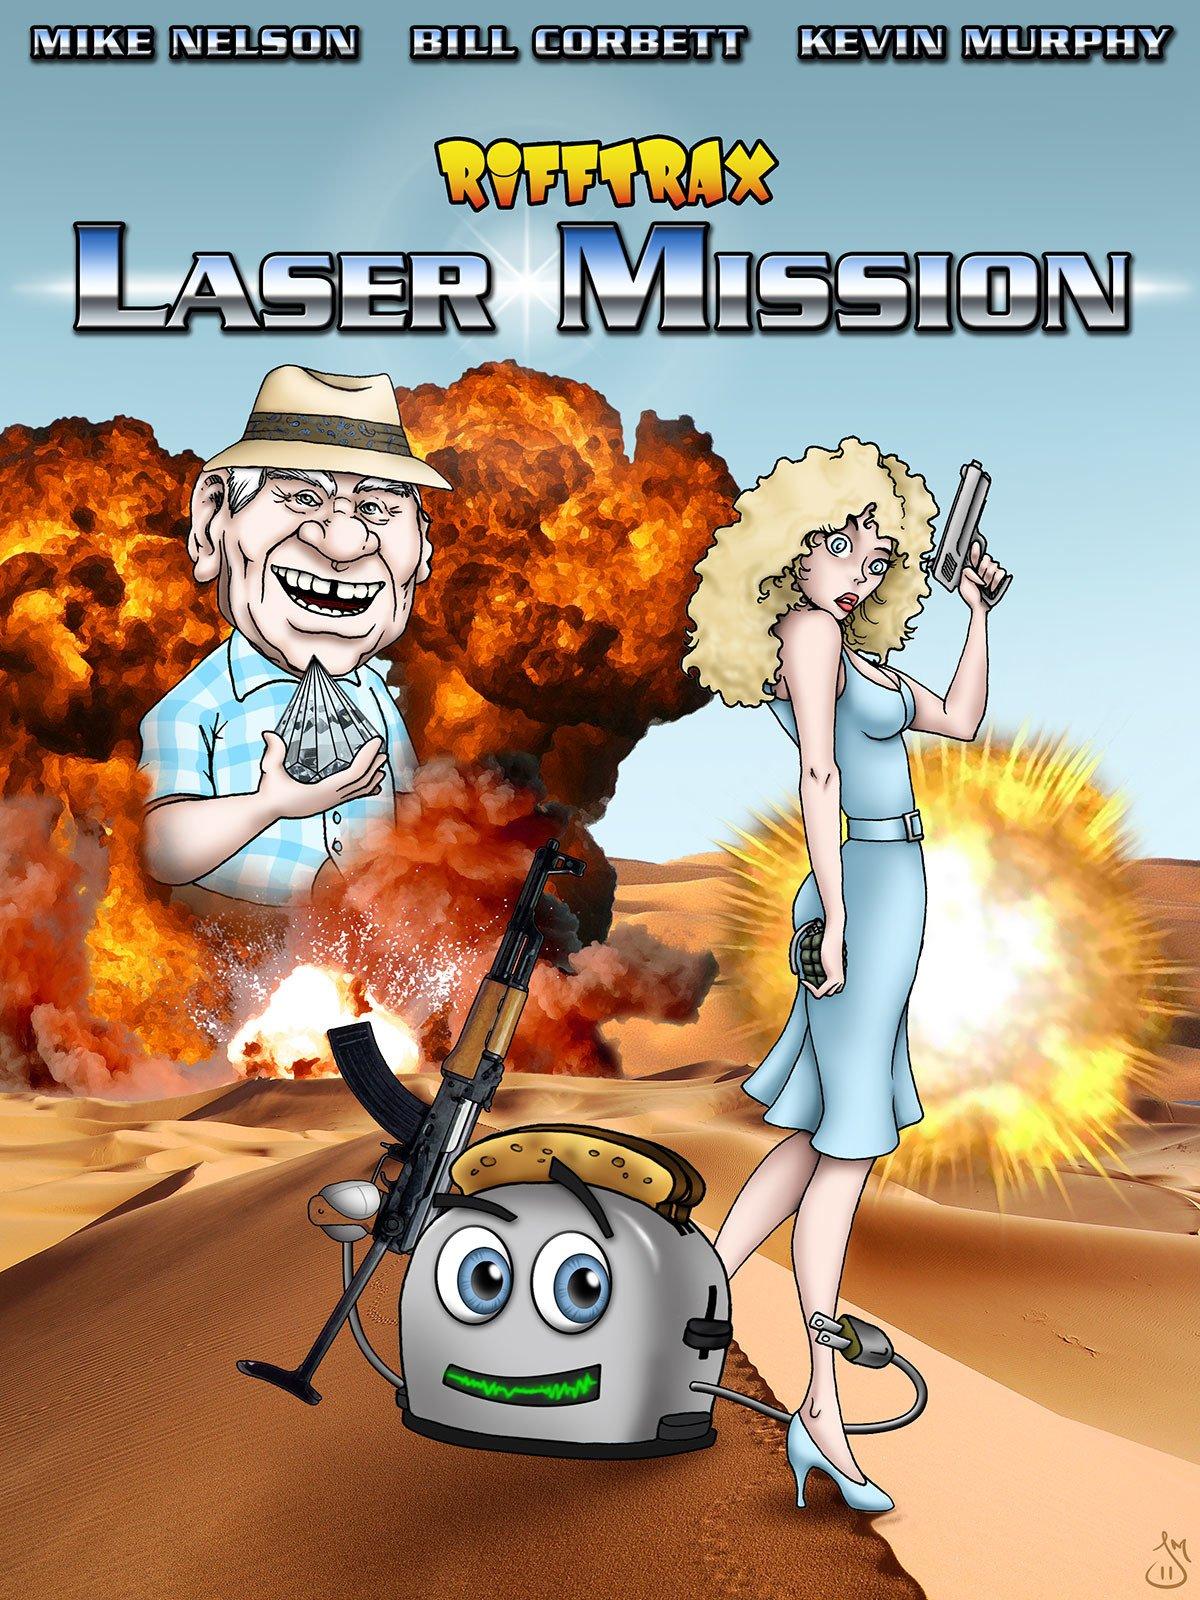 RiffTrax: Laser Mission on Amazon Prime Video UK